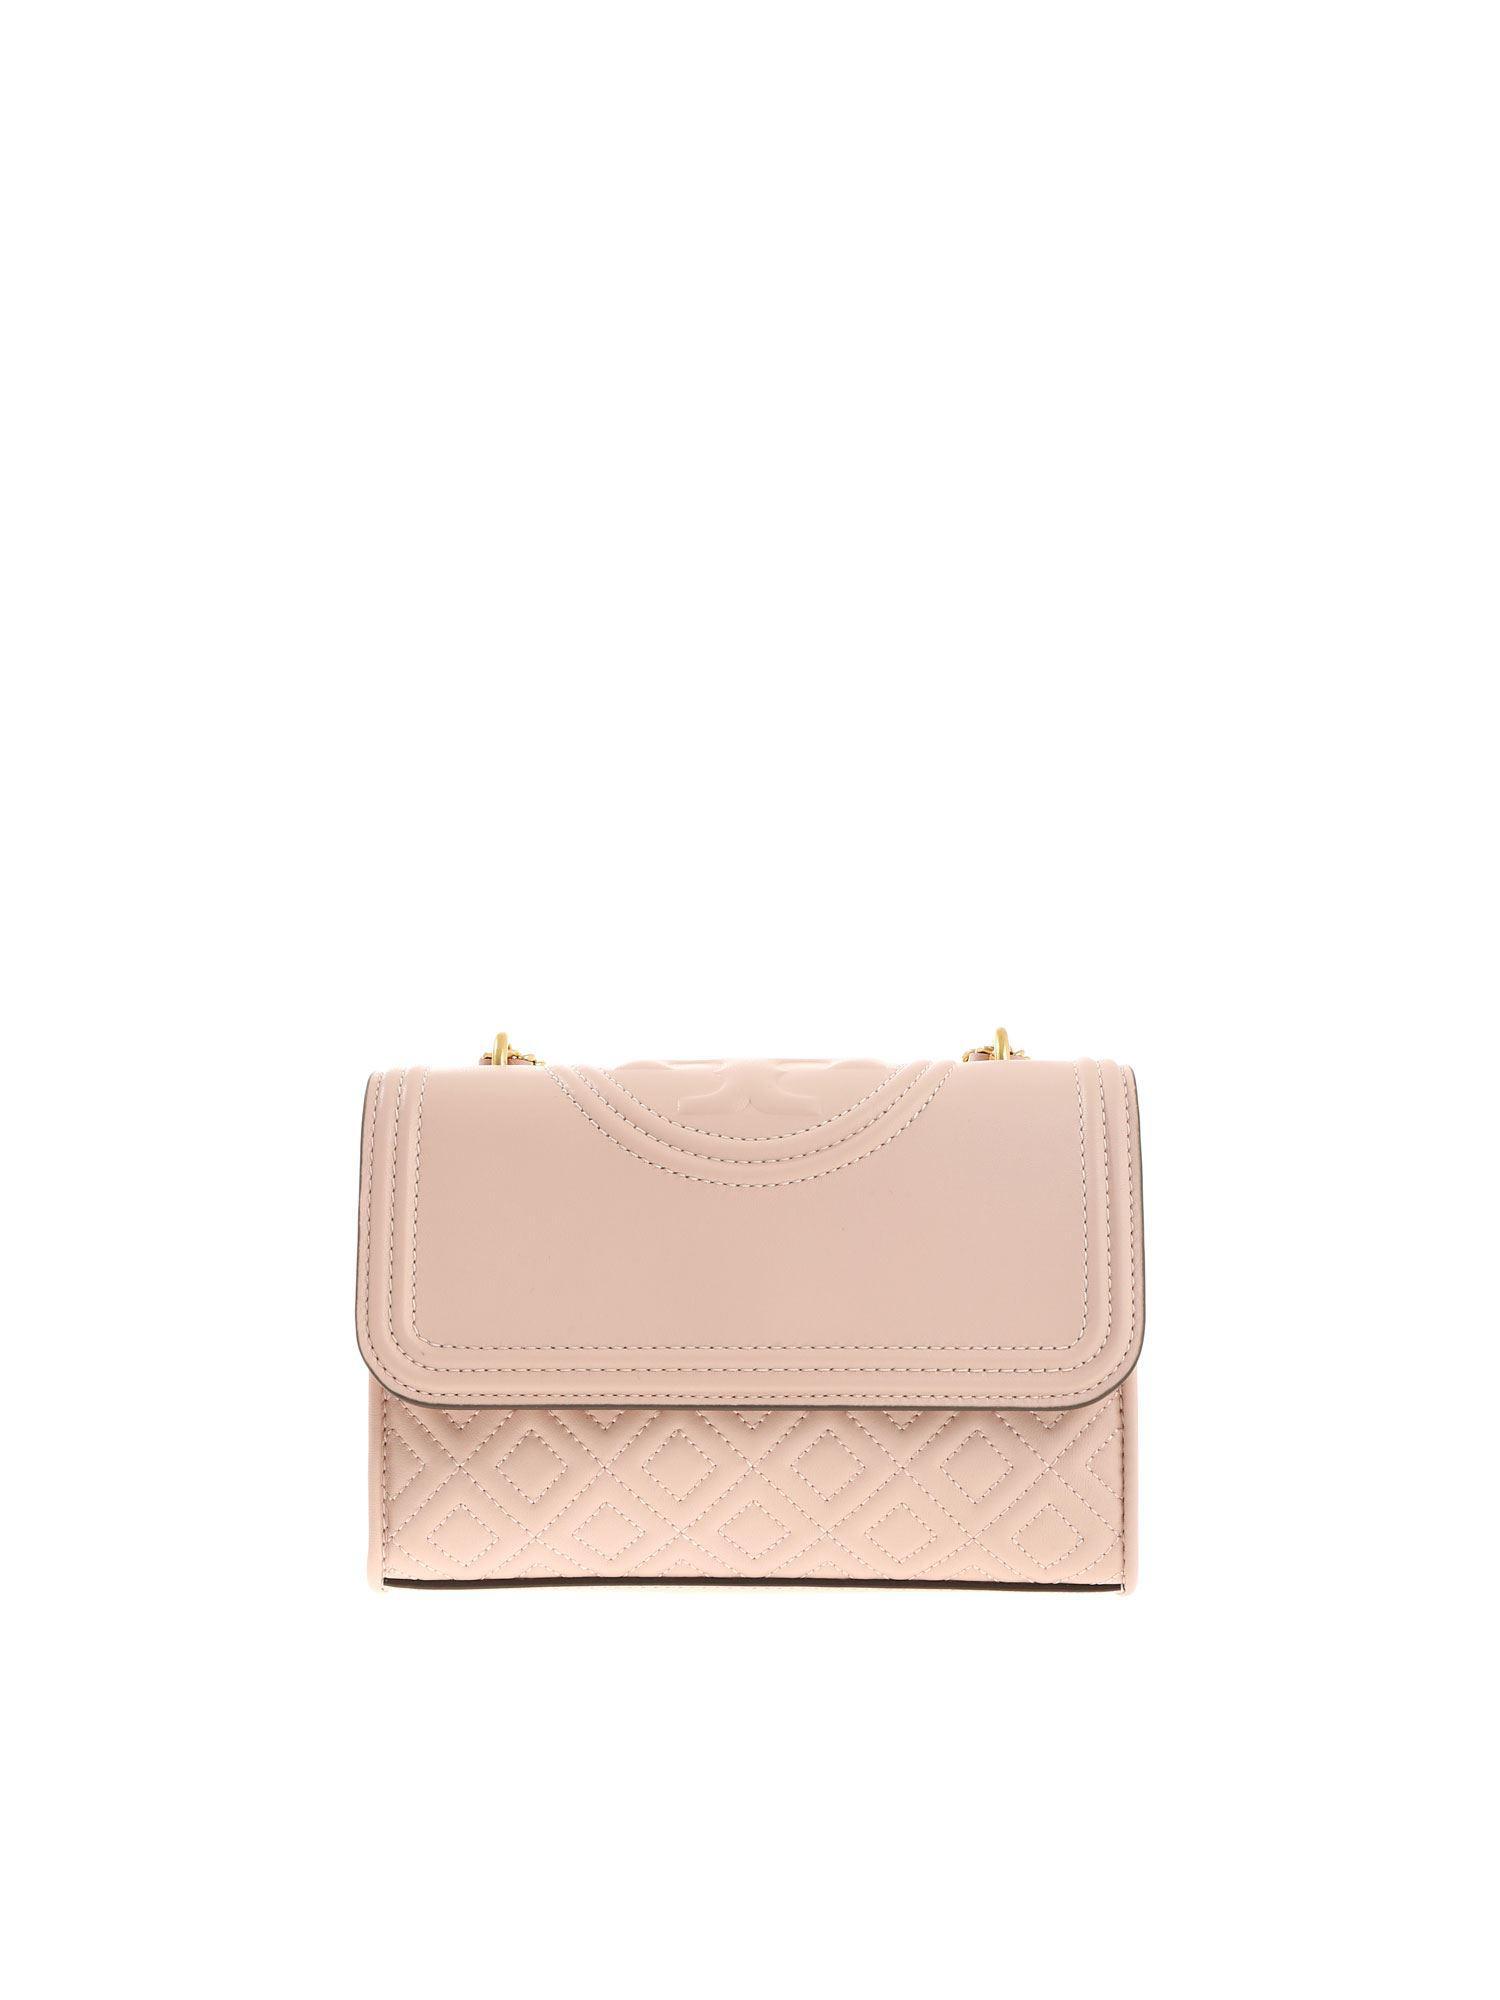 c931f6ee6804 Lyst - Tory Burch Mini Bag Shoulder Bag Women in Pink - Save ...